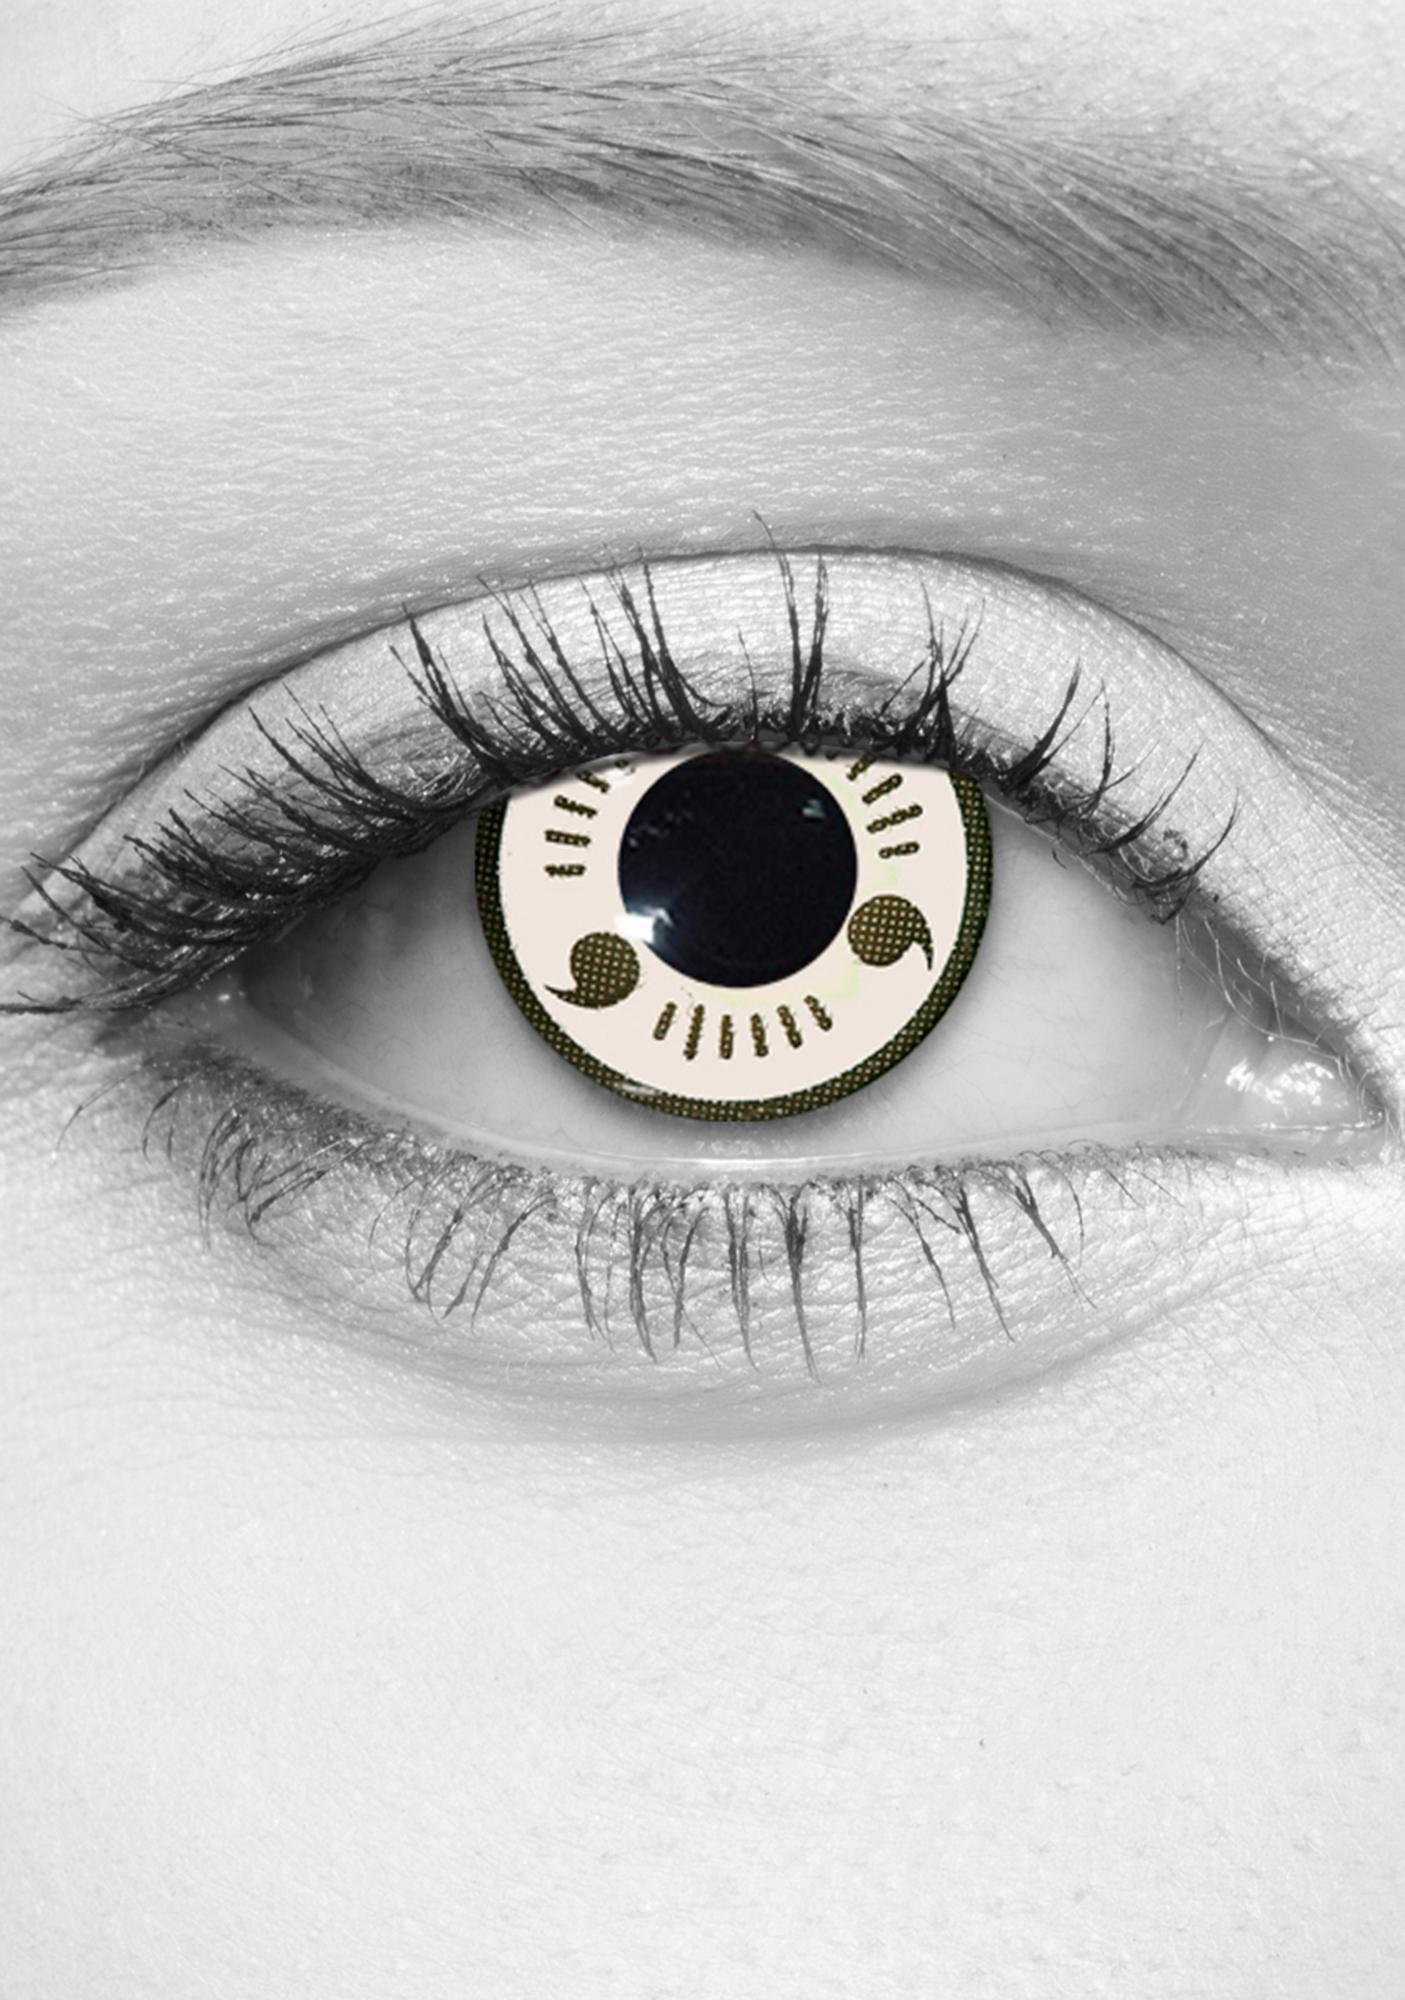 Anime Contact Lenses